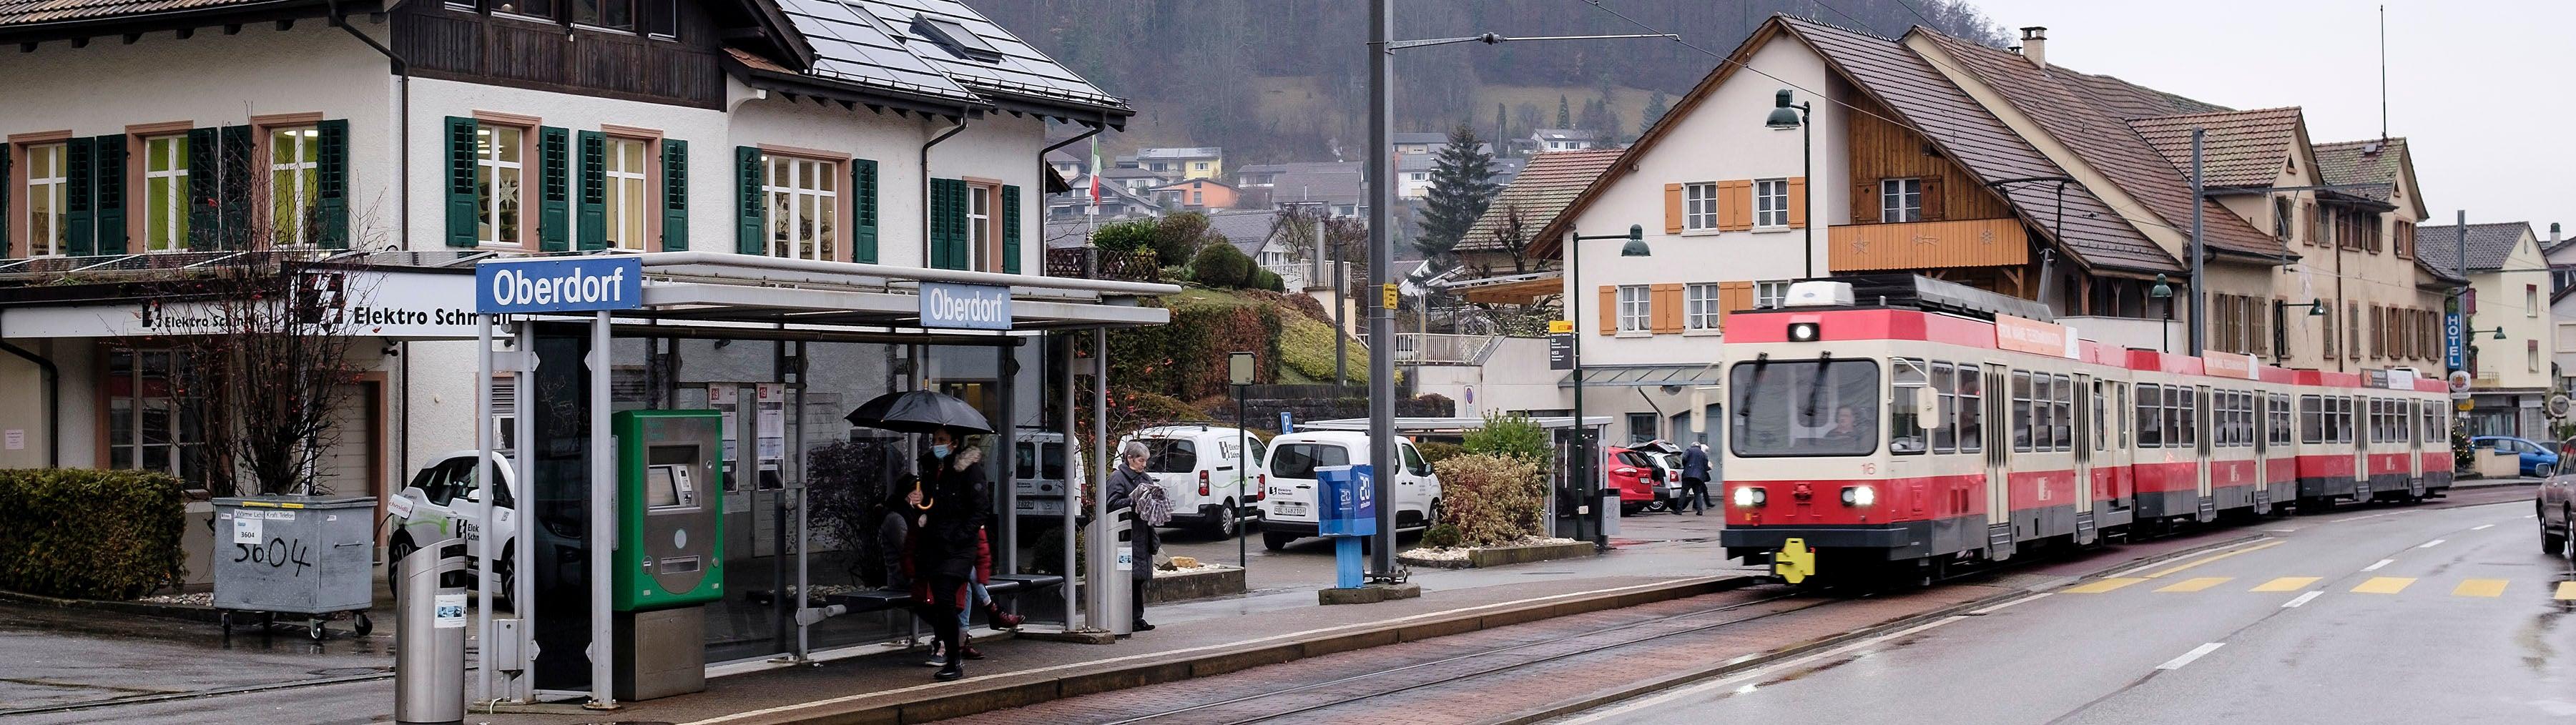 Oberdorf (BL)